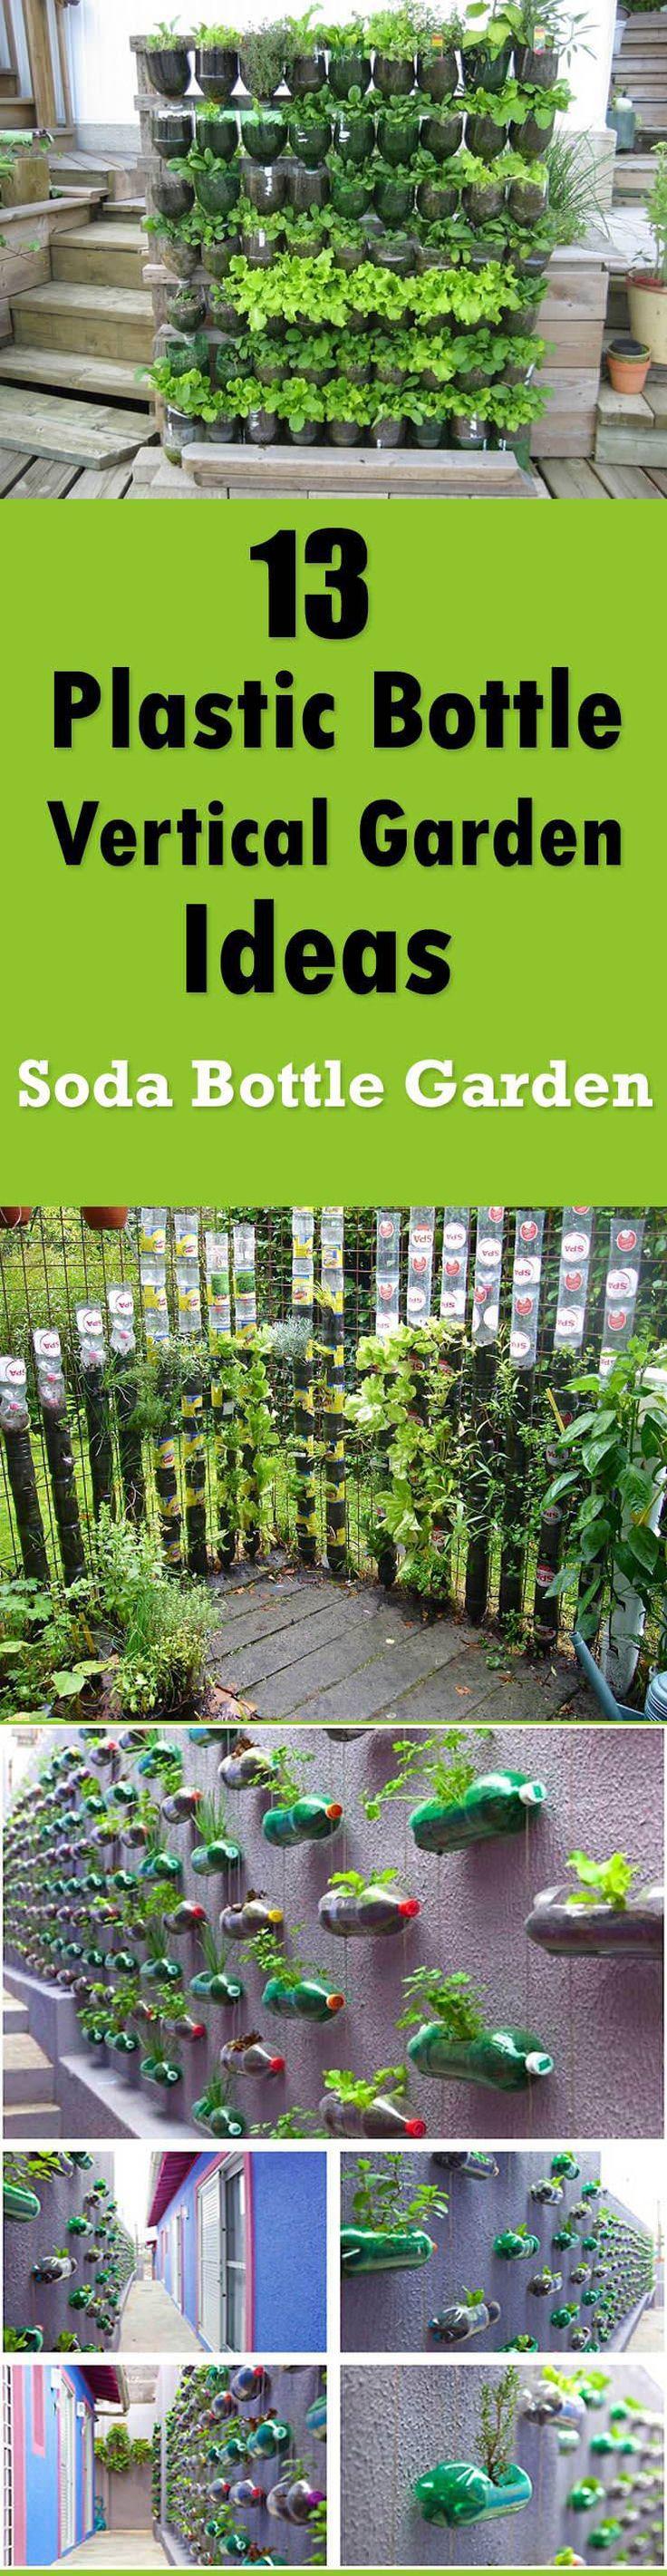 13 Soda Bottle Vertical Garden Ideas http://livedan330.com/2016/01/22/13-soda-bottle-vertical-garden-ideas/